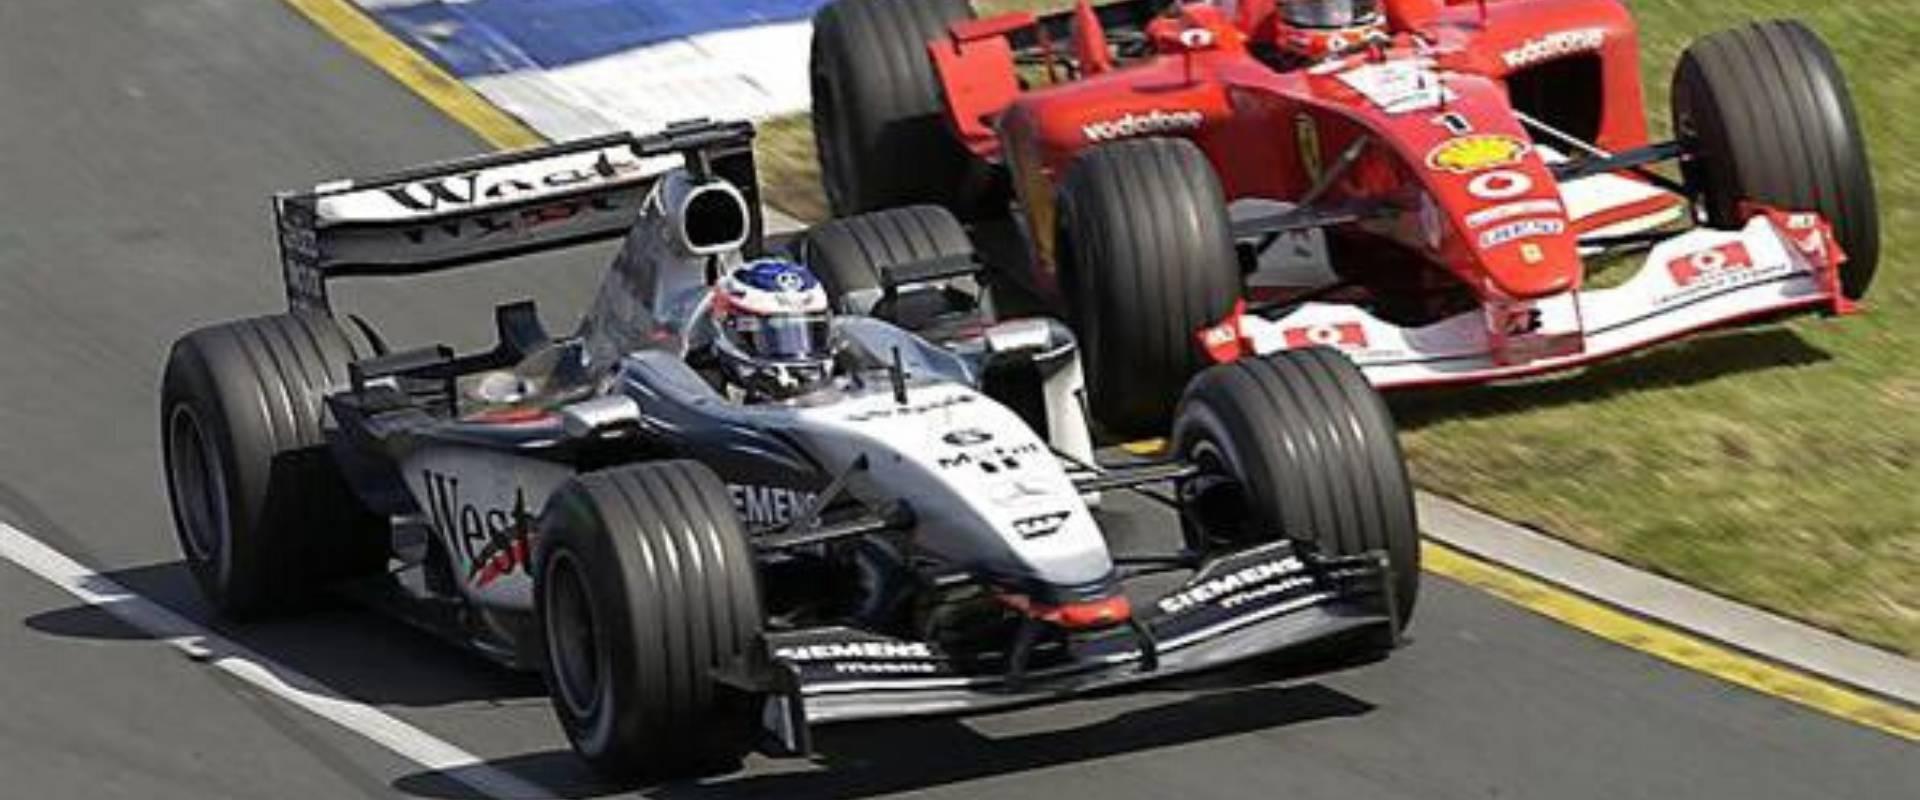 Aston Martin, Ferrari, & McLaren's Challenges